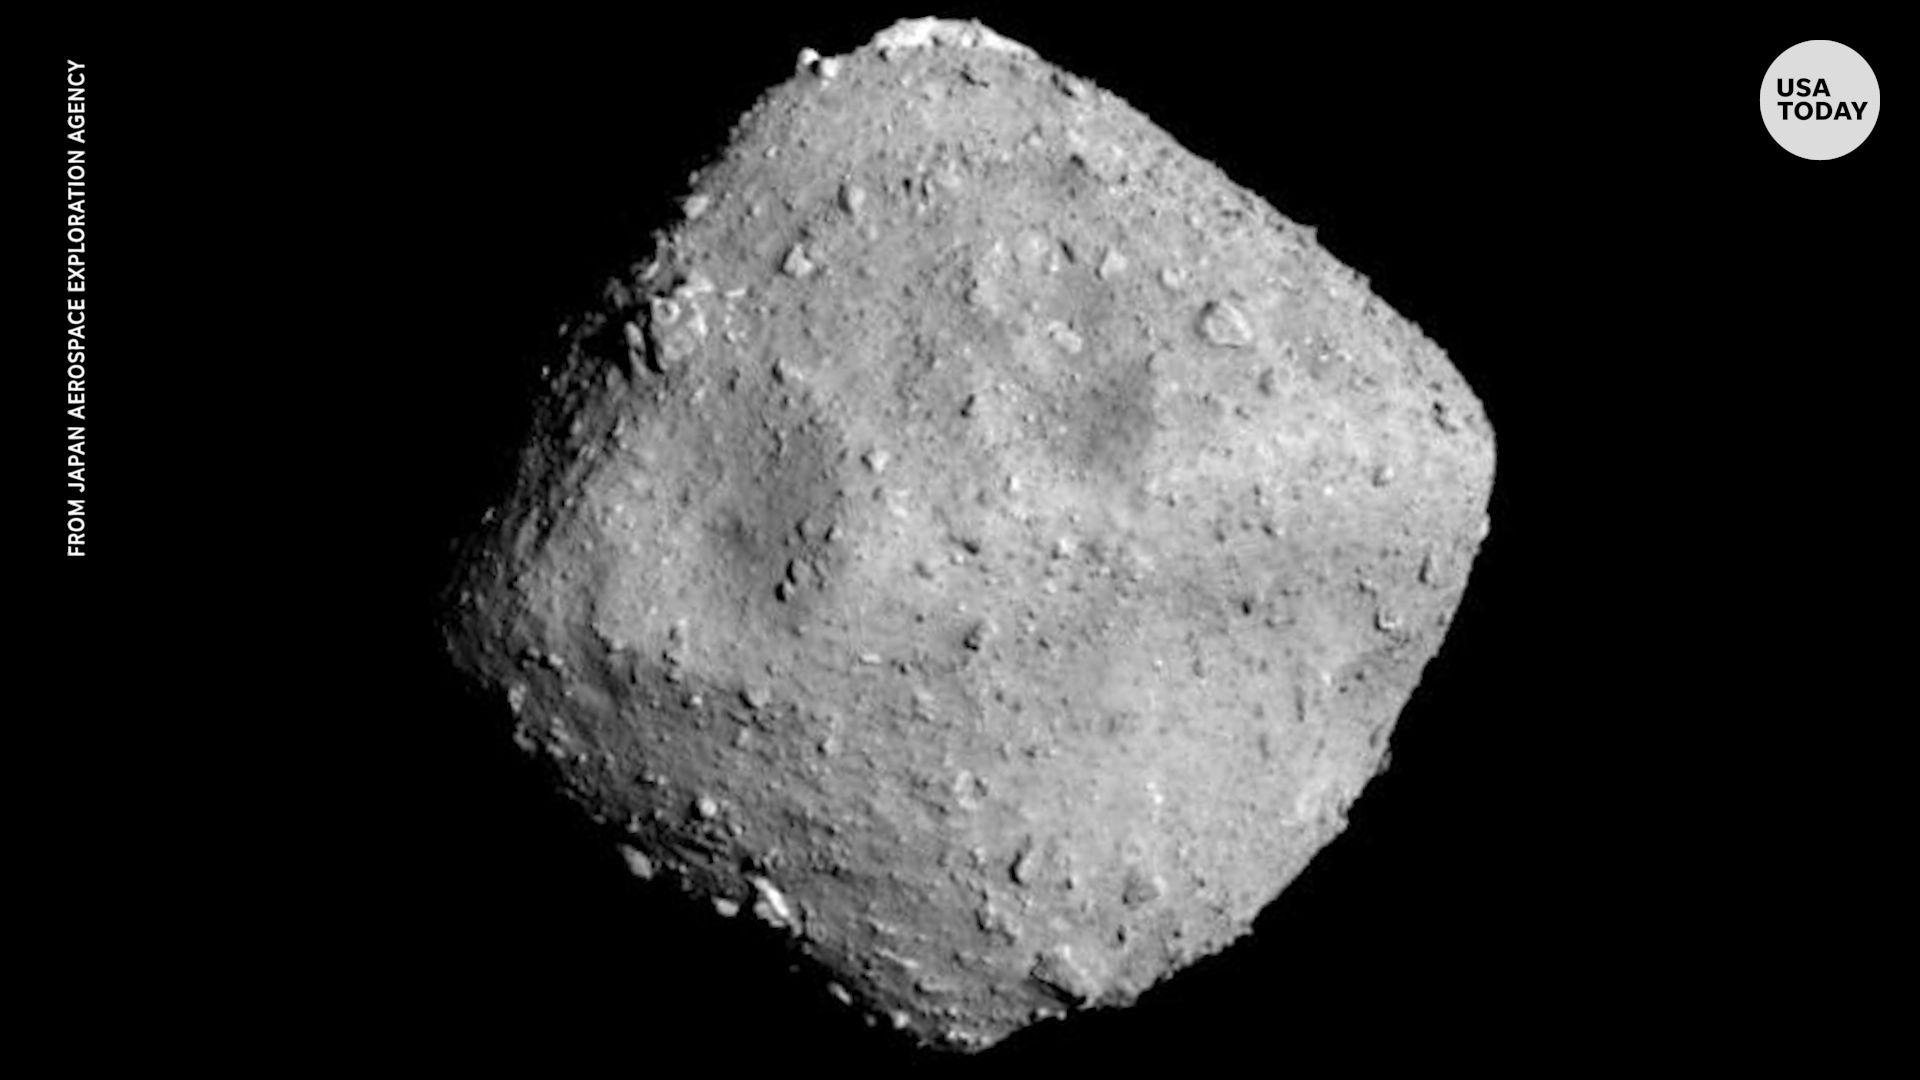 Kvue com japanese spacecraft. Asteroid clipart round stone